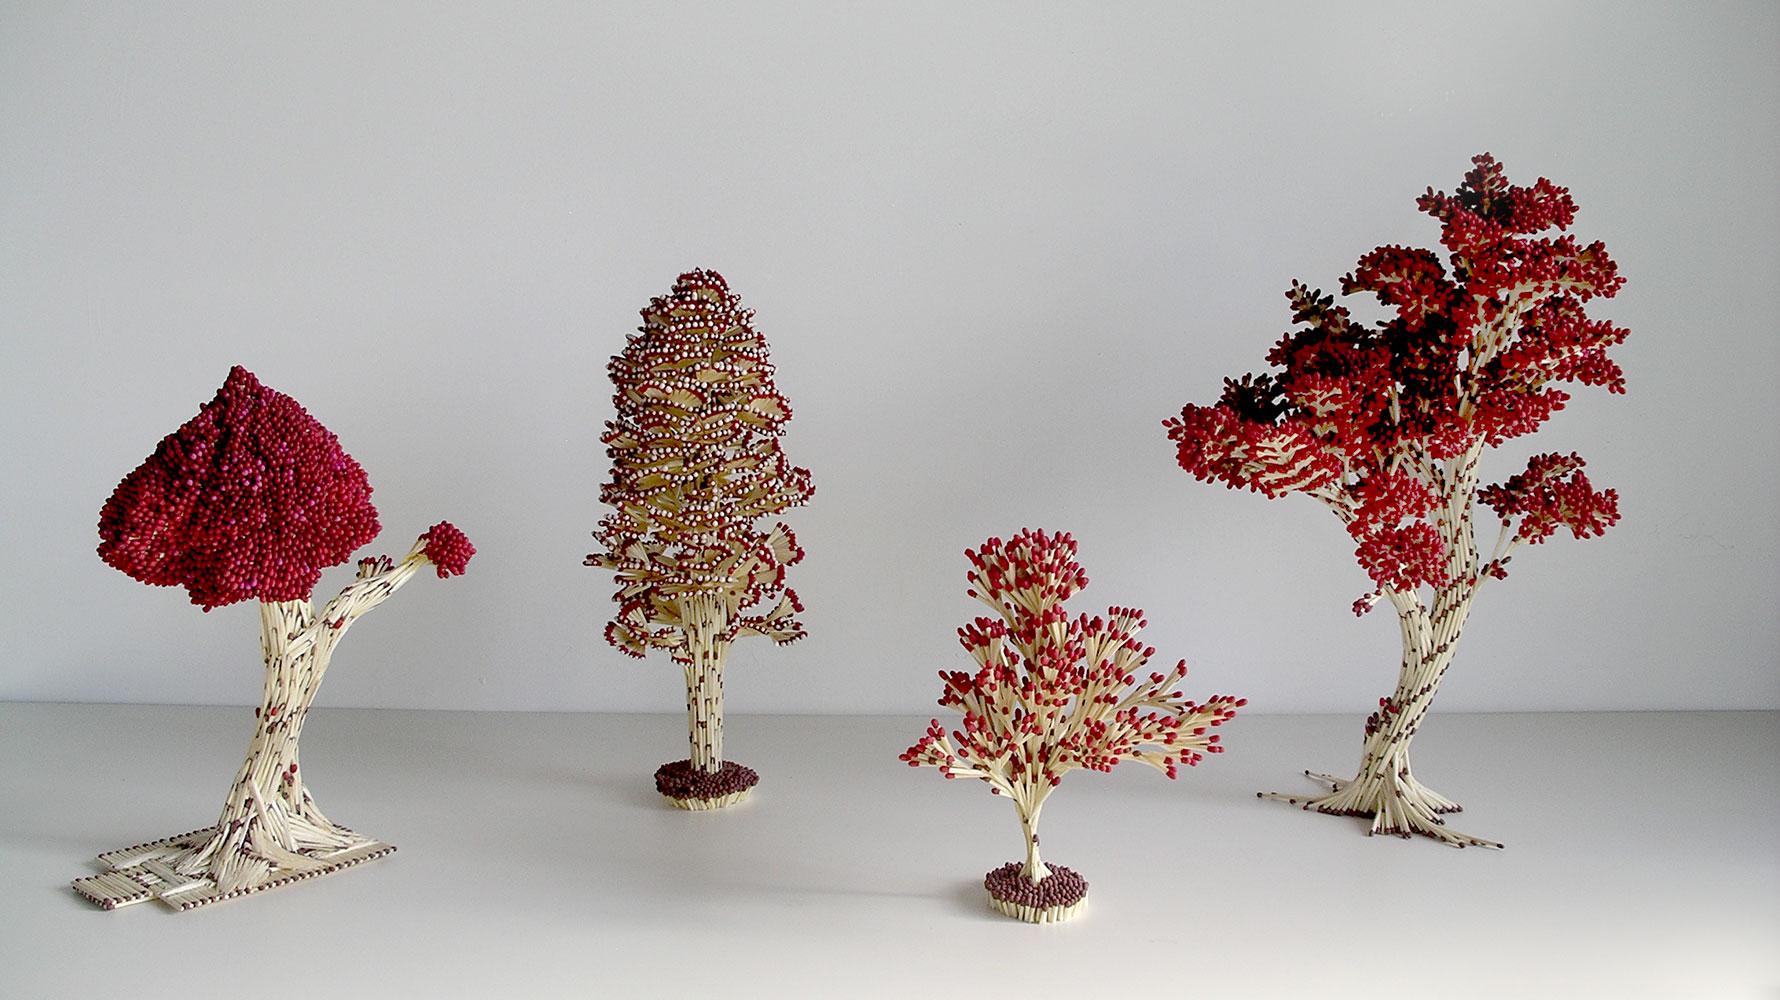 4-tree-1780